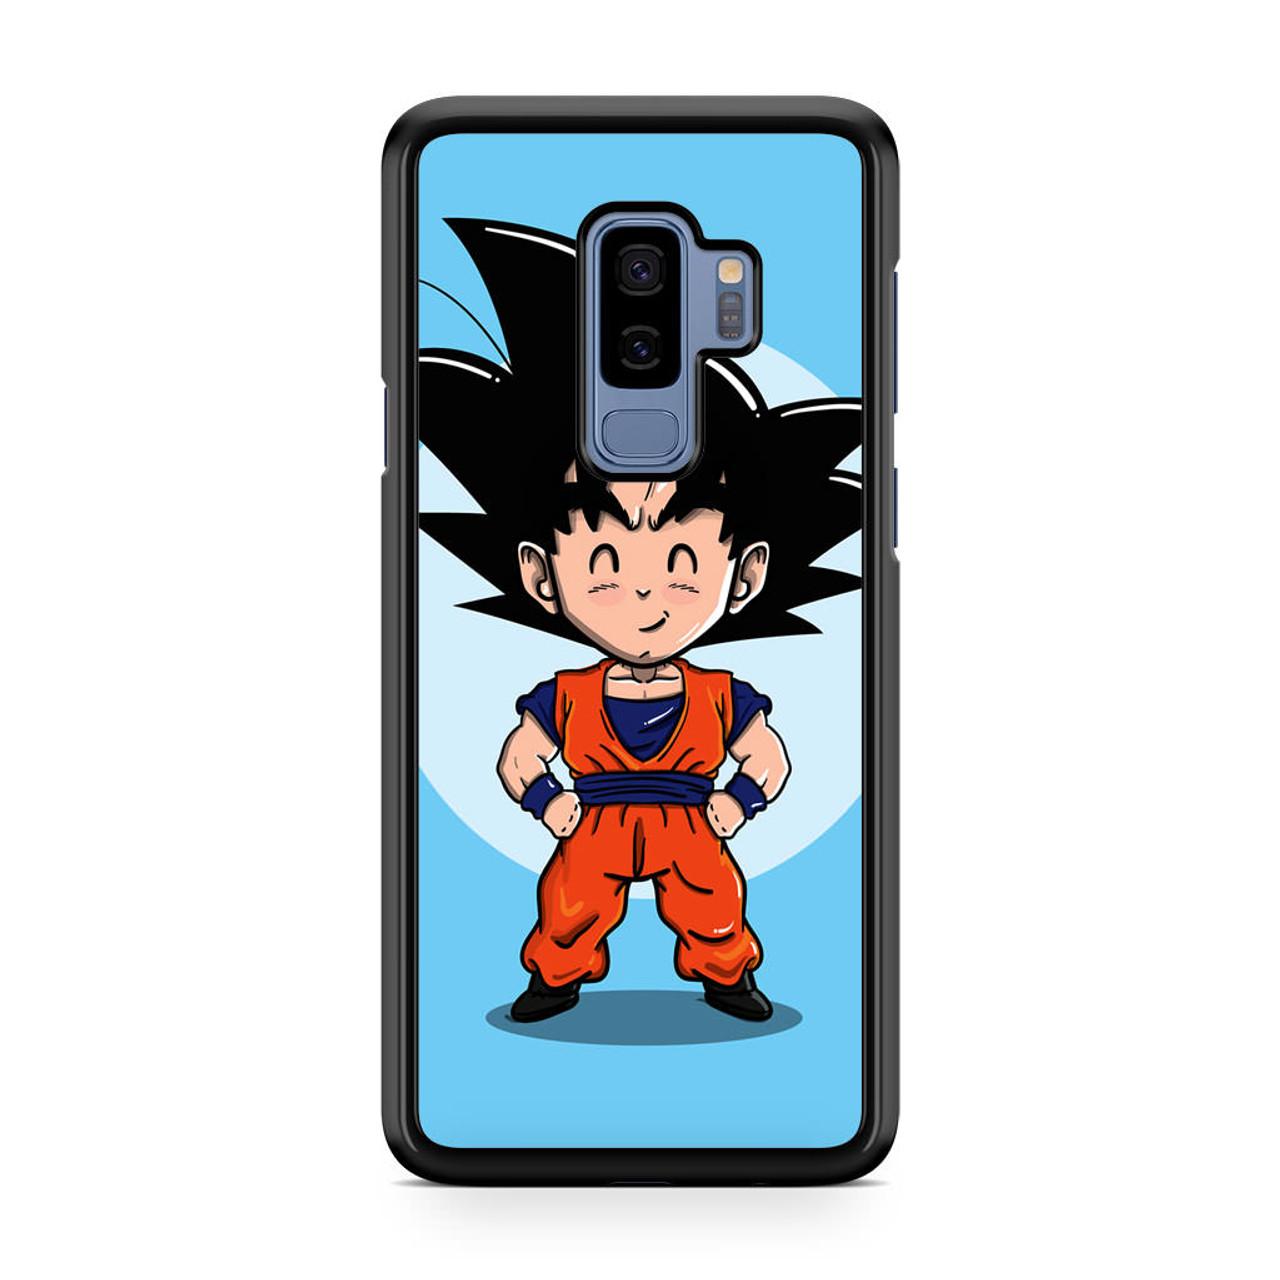 reputable site e34e3 0cf21 Dragon Ball Z Goku Chibi1 Samsung Galaxy S9 Plus Case